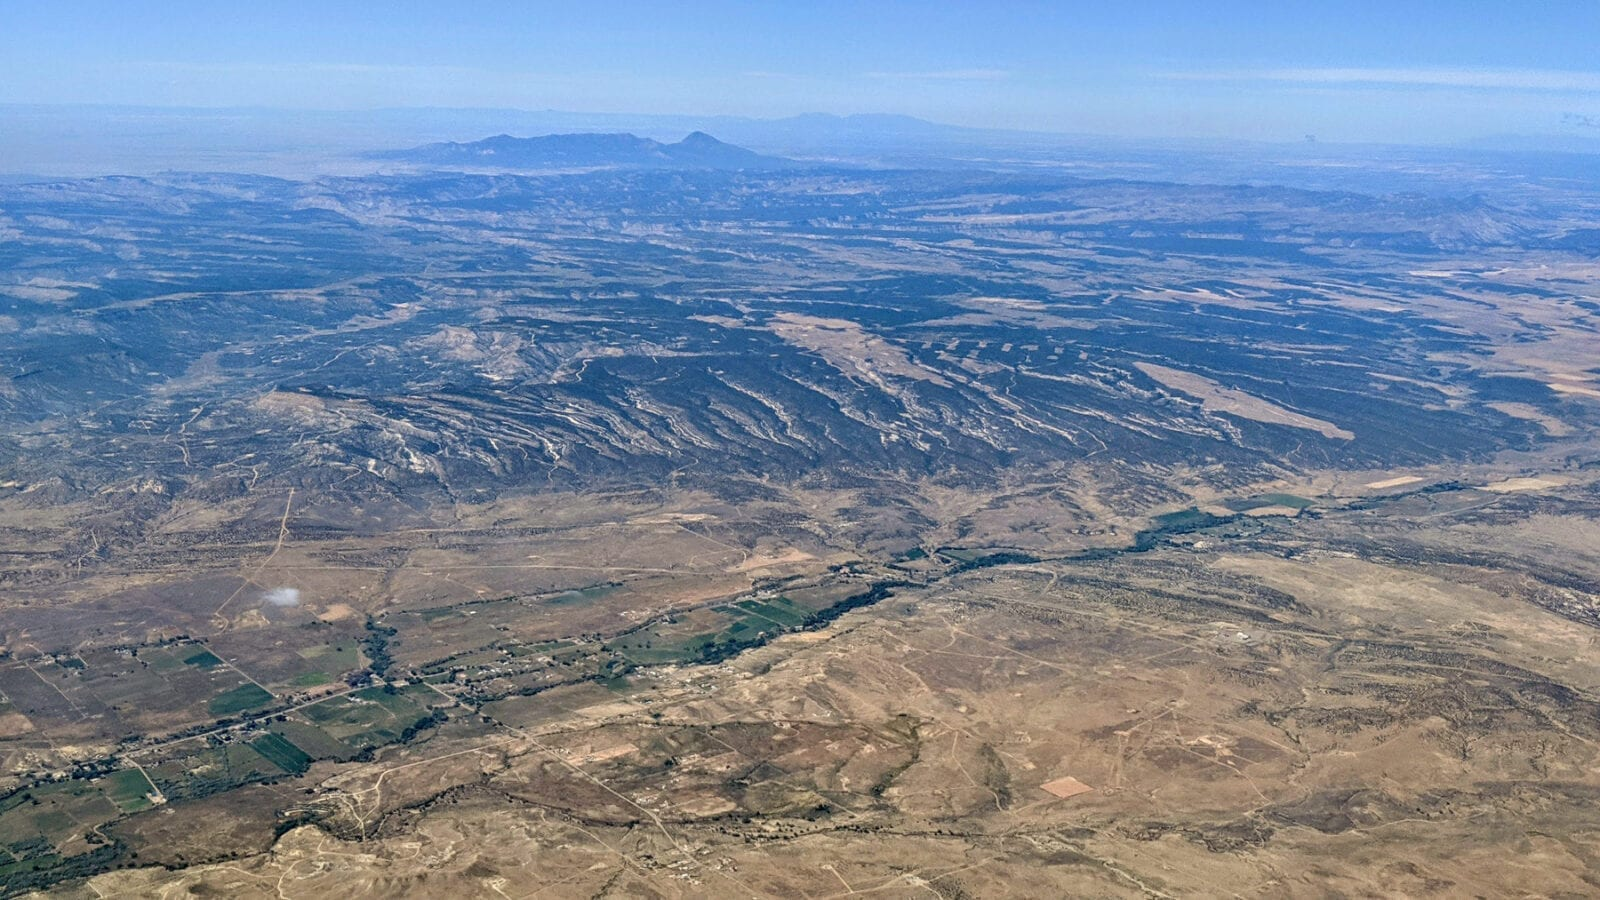 Aerial Image of the La Plata River in Colorado